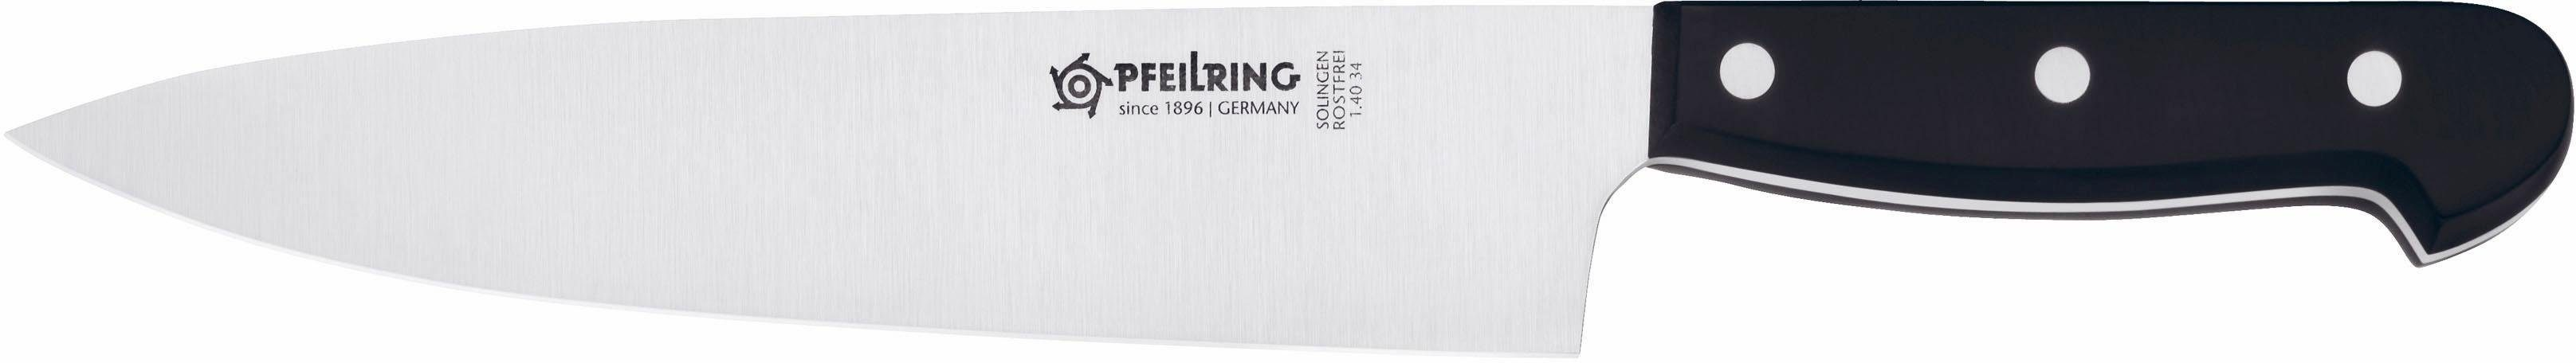 PFEILRING Kochmesser, rostfrei, Made in Germany, 20 cm, »CLASSIC-LINE«